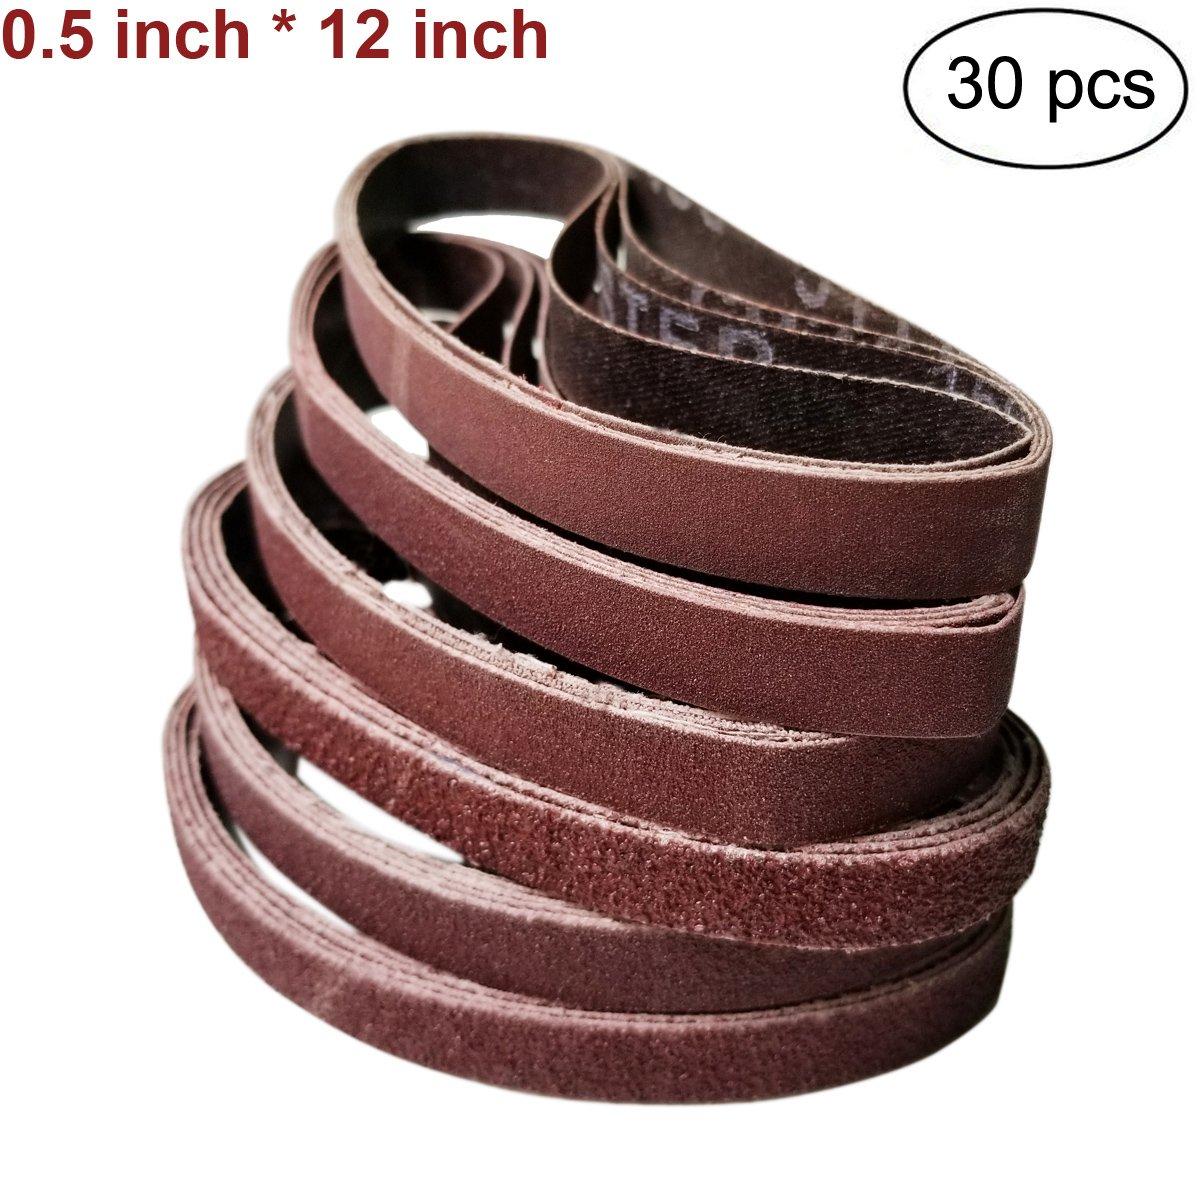 30 PCS Assortment 1/2 inch x 12 inch Coarse P60 P80 Grit/Medium P120 P240 Grit/Fine P400 Grit Knife Sharpene Aluminum Oxide Sanding Belts